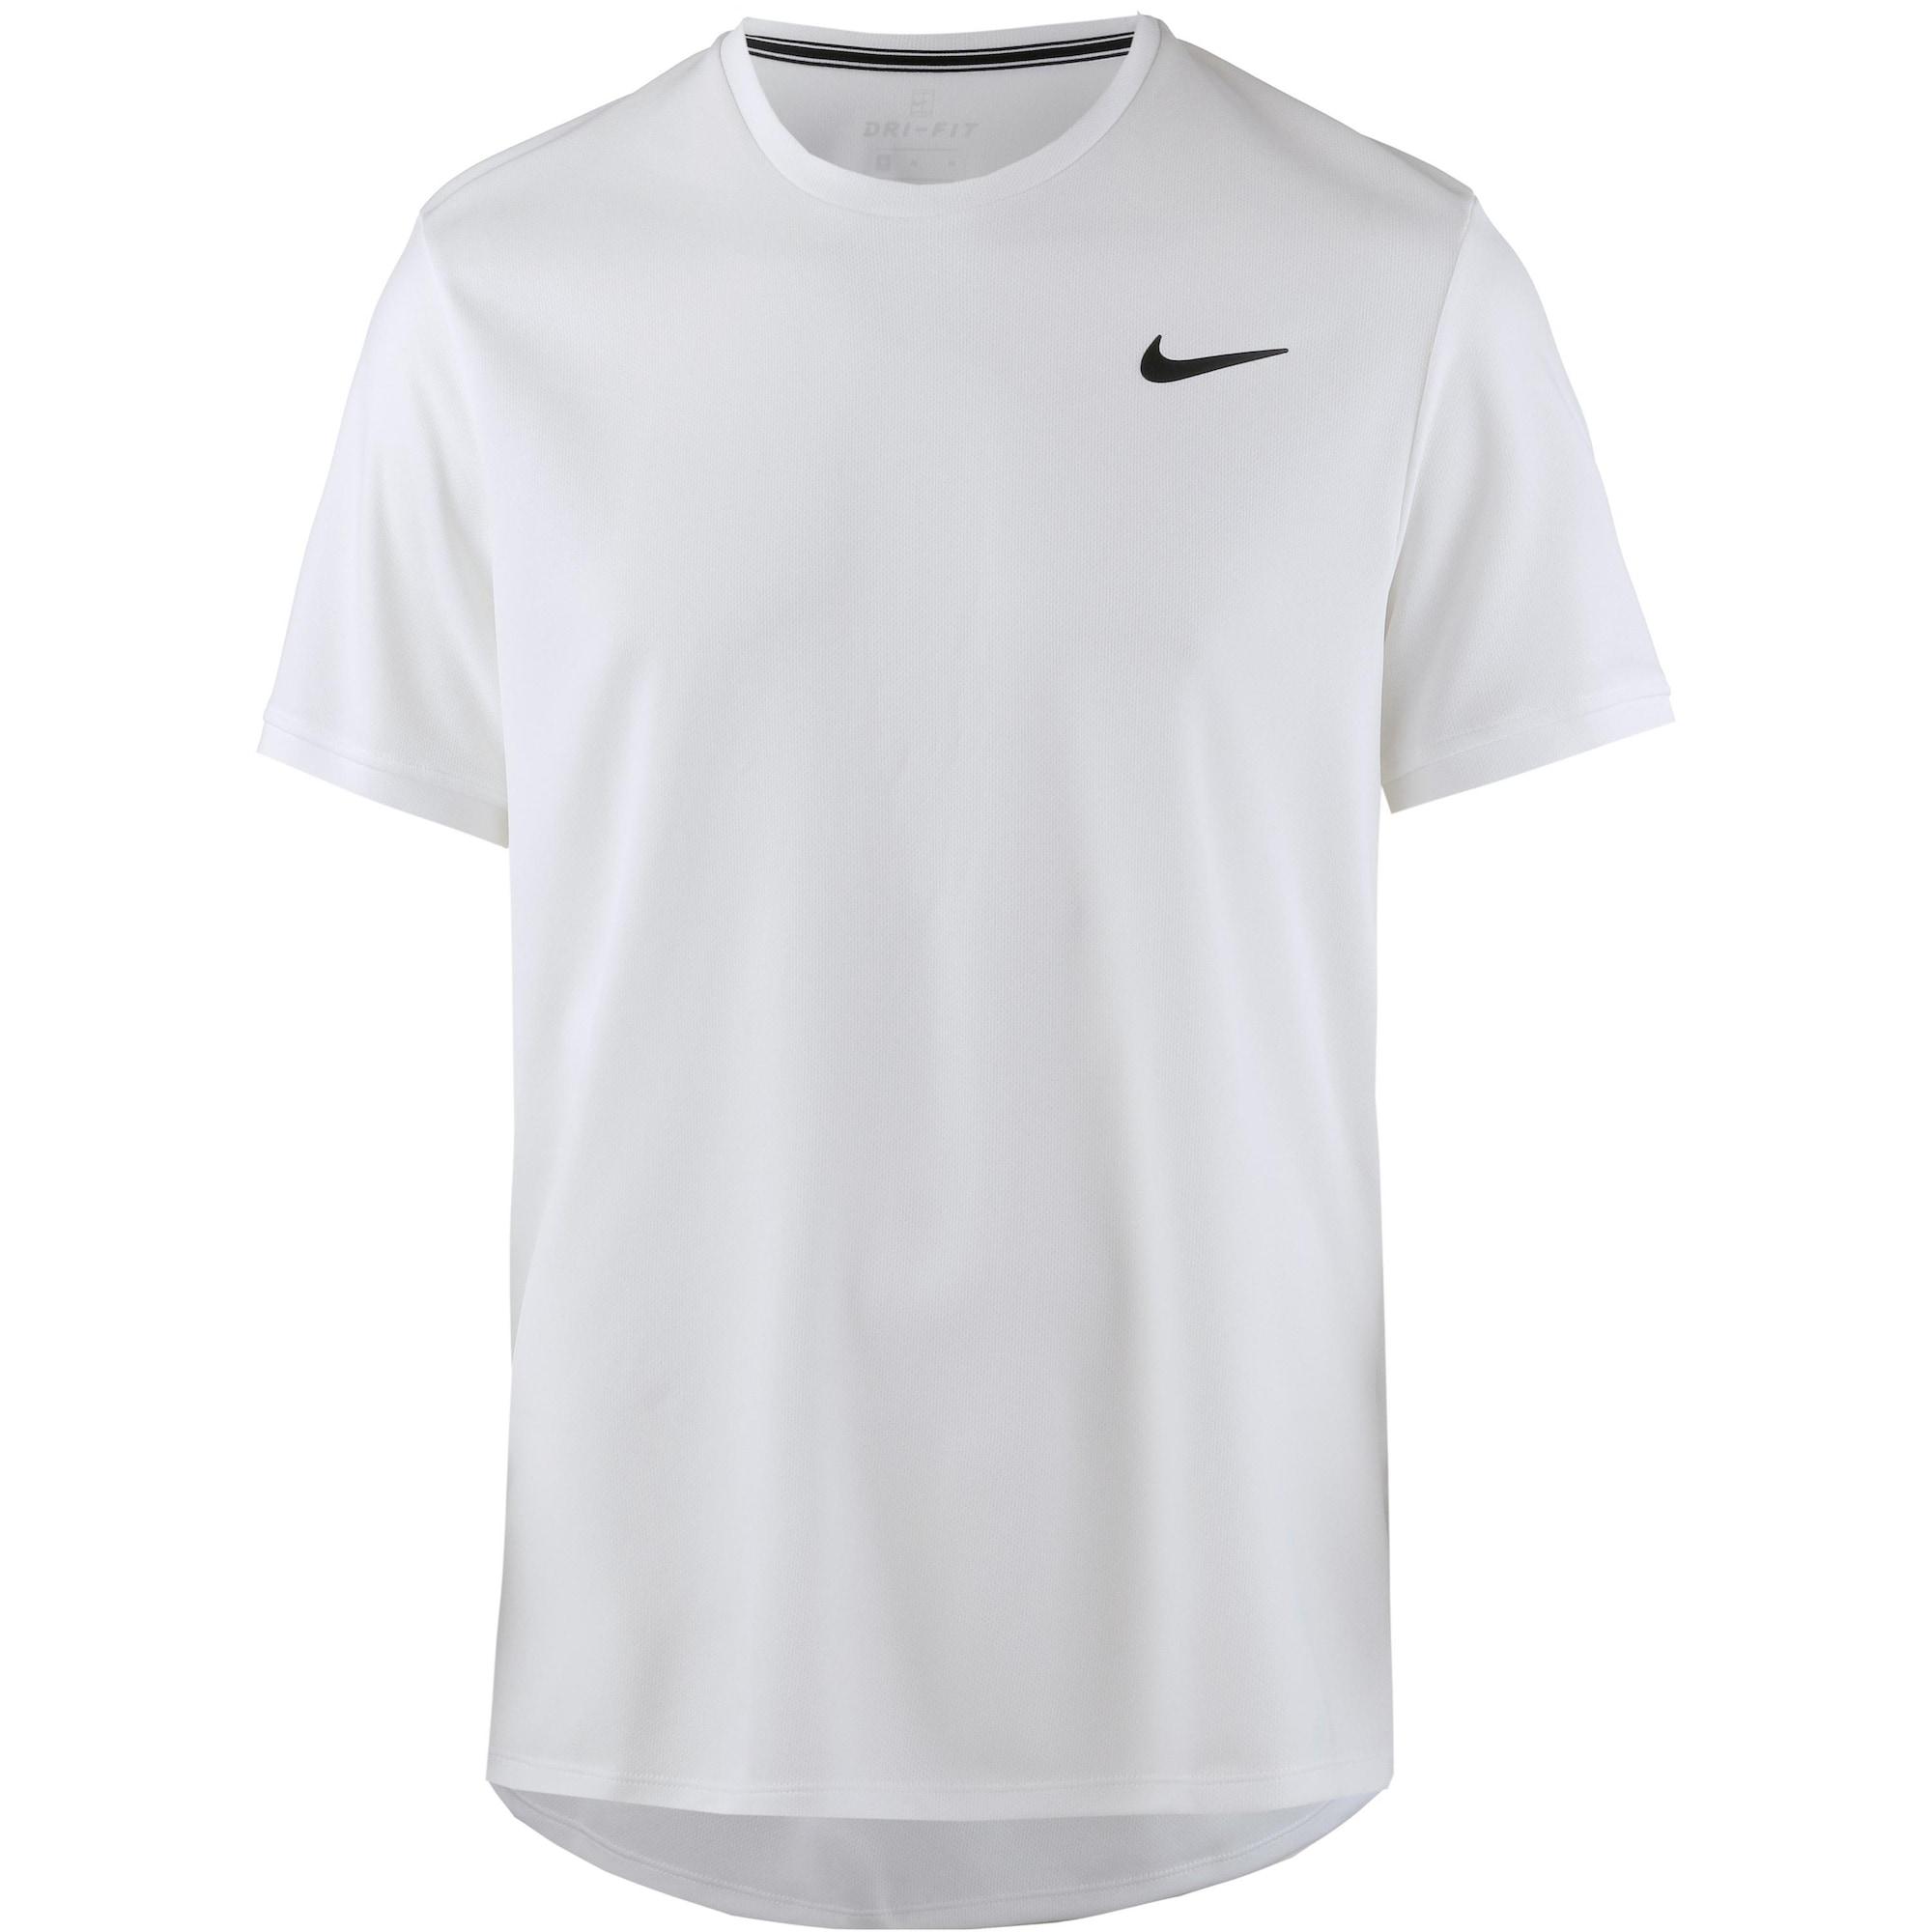 Tennisshirt | Sportbekleidung > Sportshirts > Tennisshirts | Nike